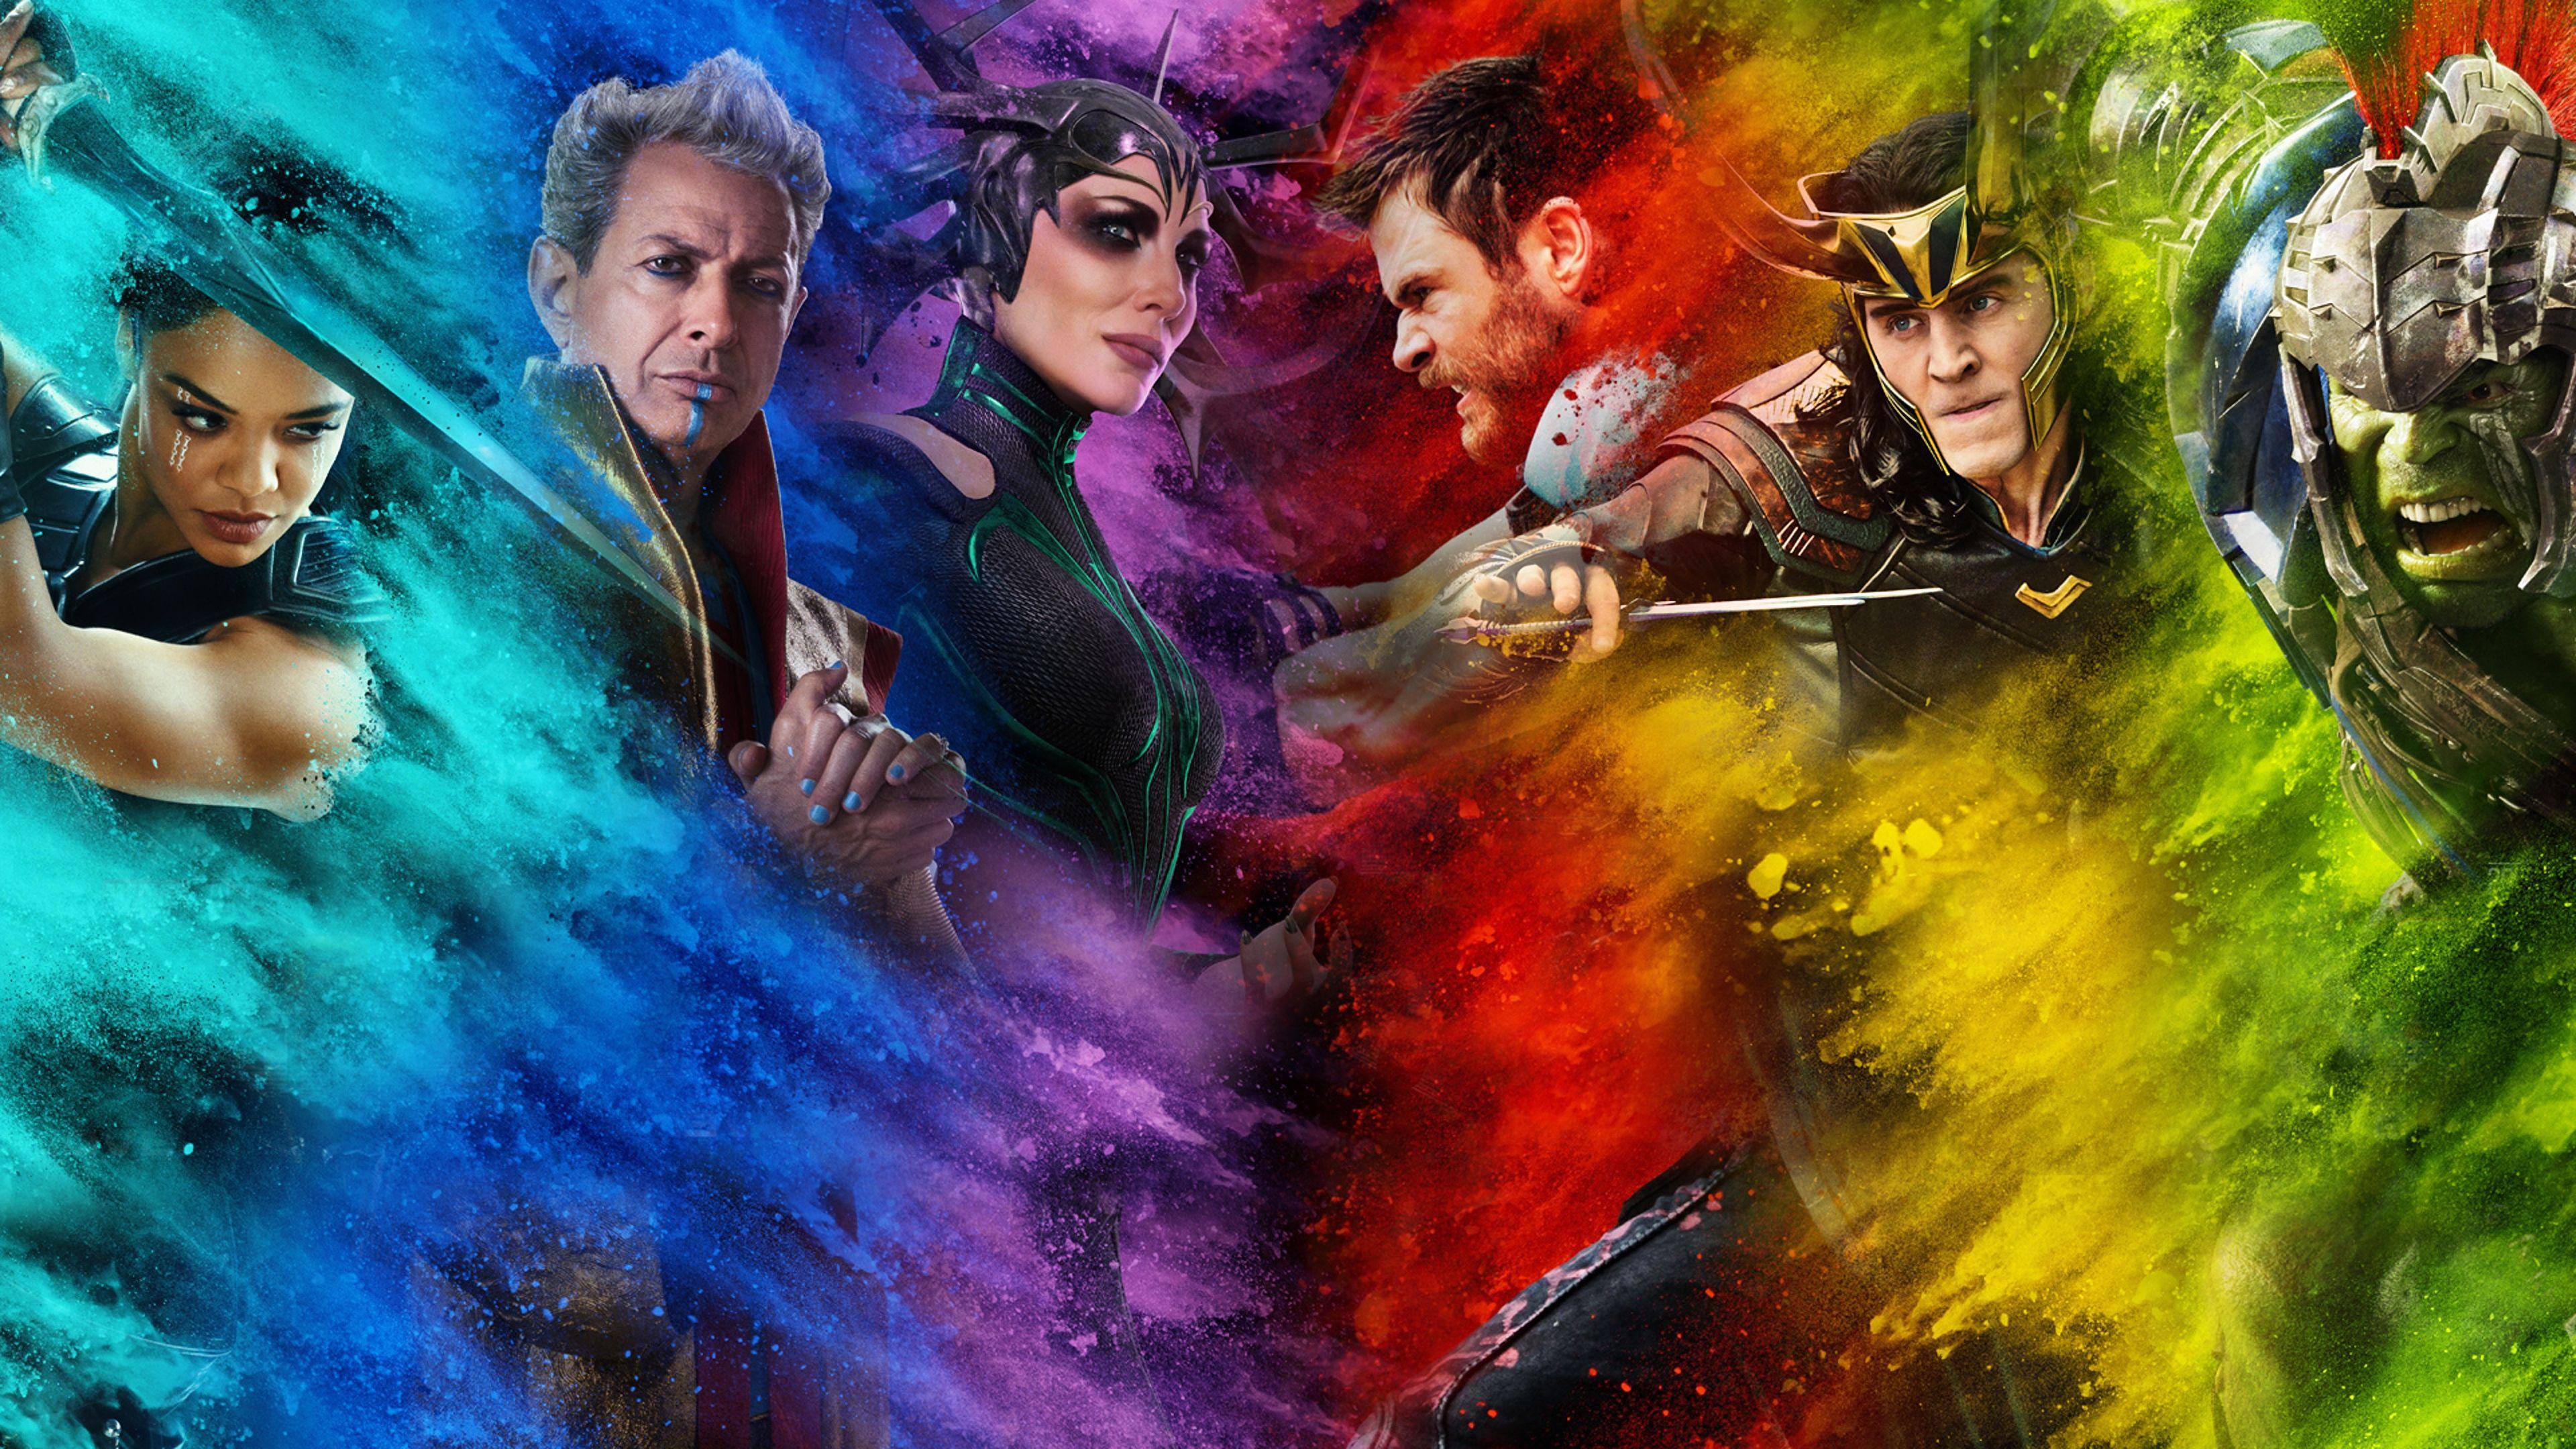 Uhd 4k Thor Ragnarok Characters Valkyrie Grandmaster Hela Thor Loki And Hulk Tessa Thompson Jeff Goldblum Cate Magnificos Chris Hemsworth Marvel Comics